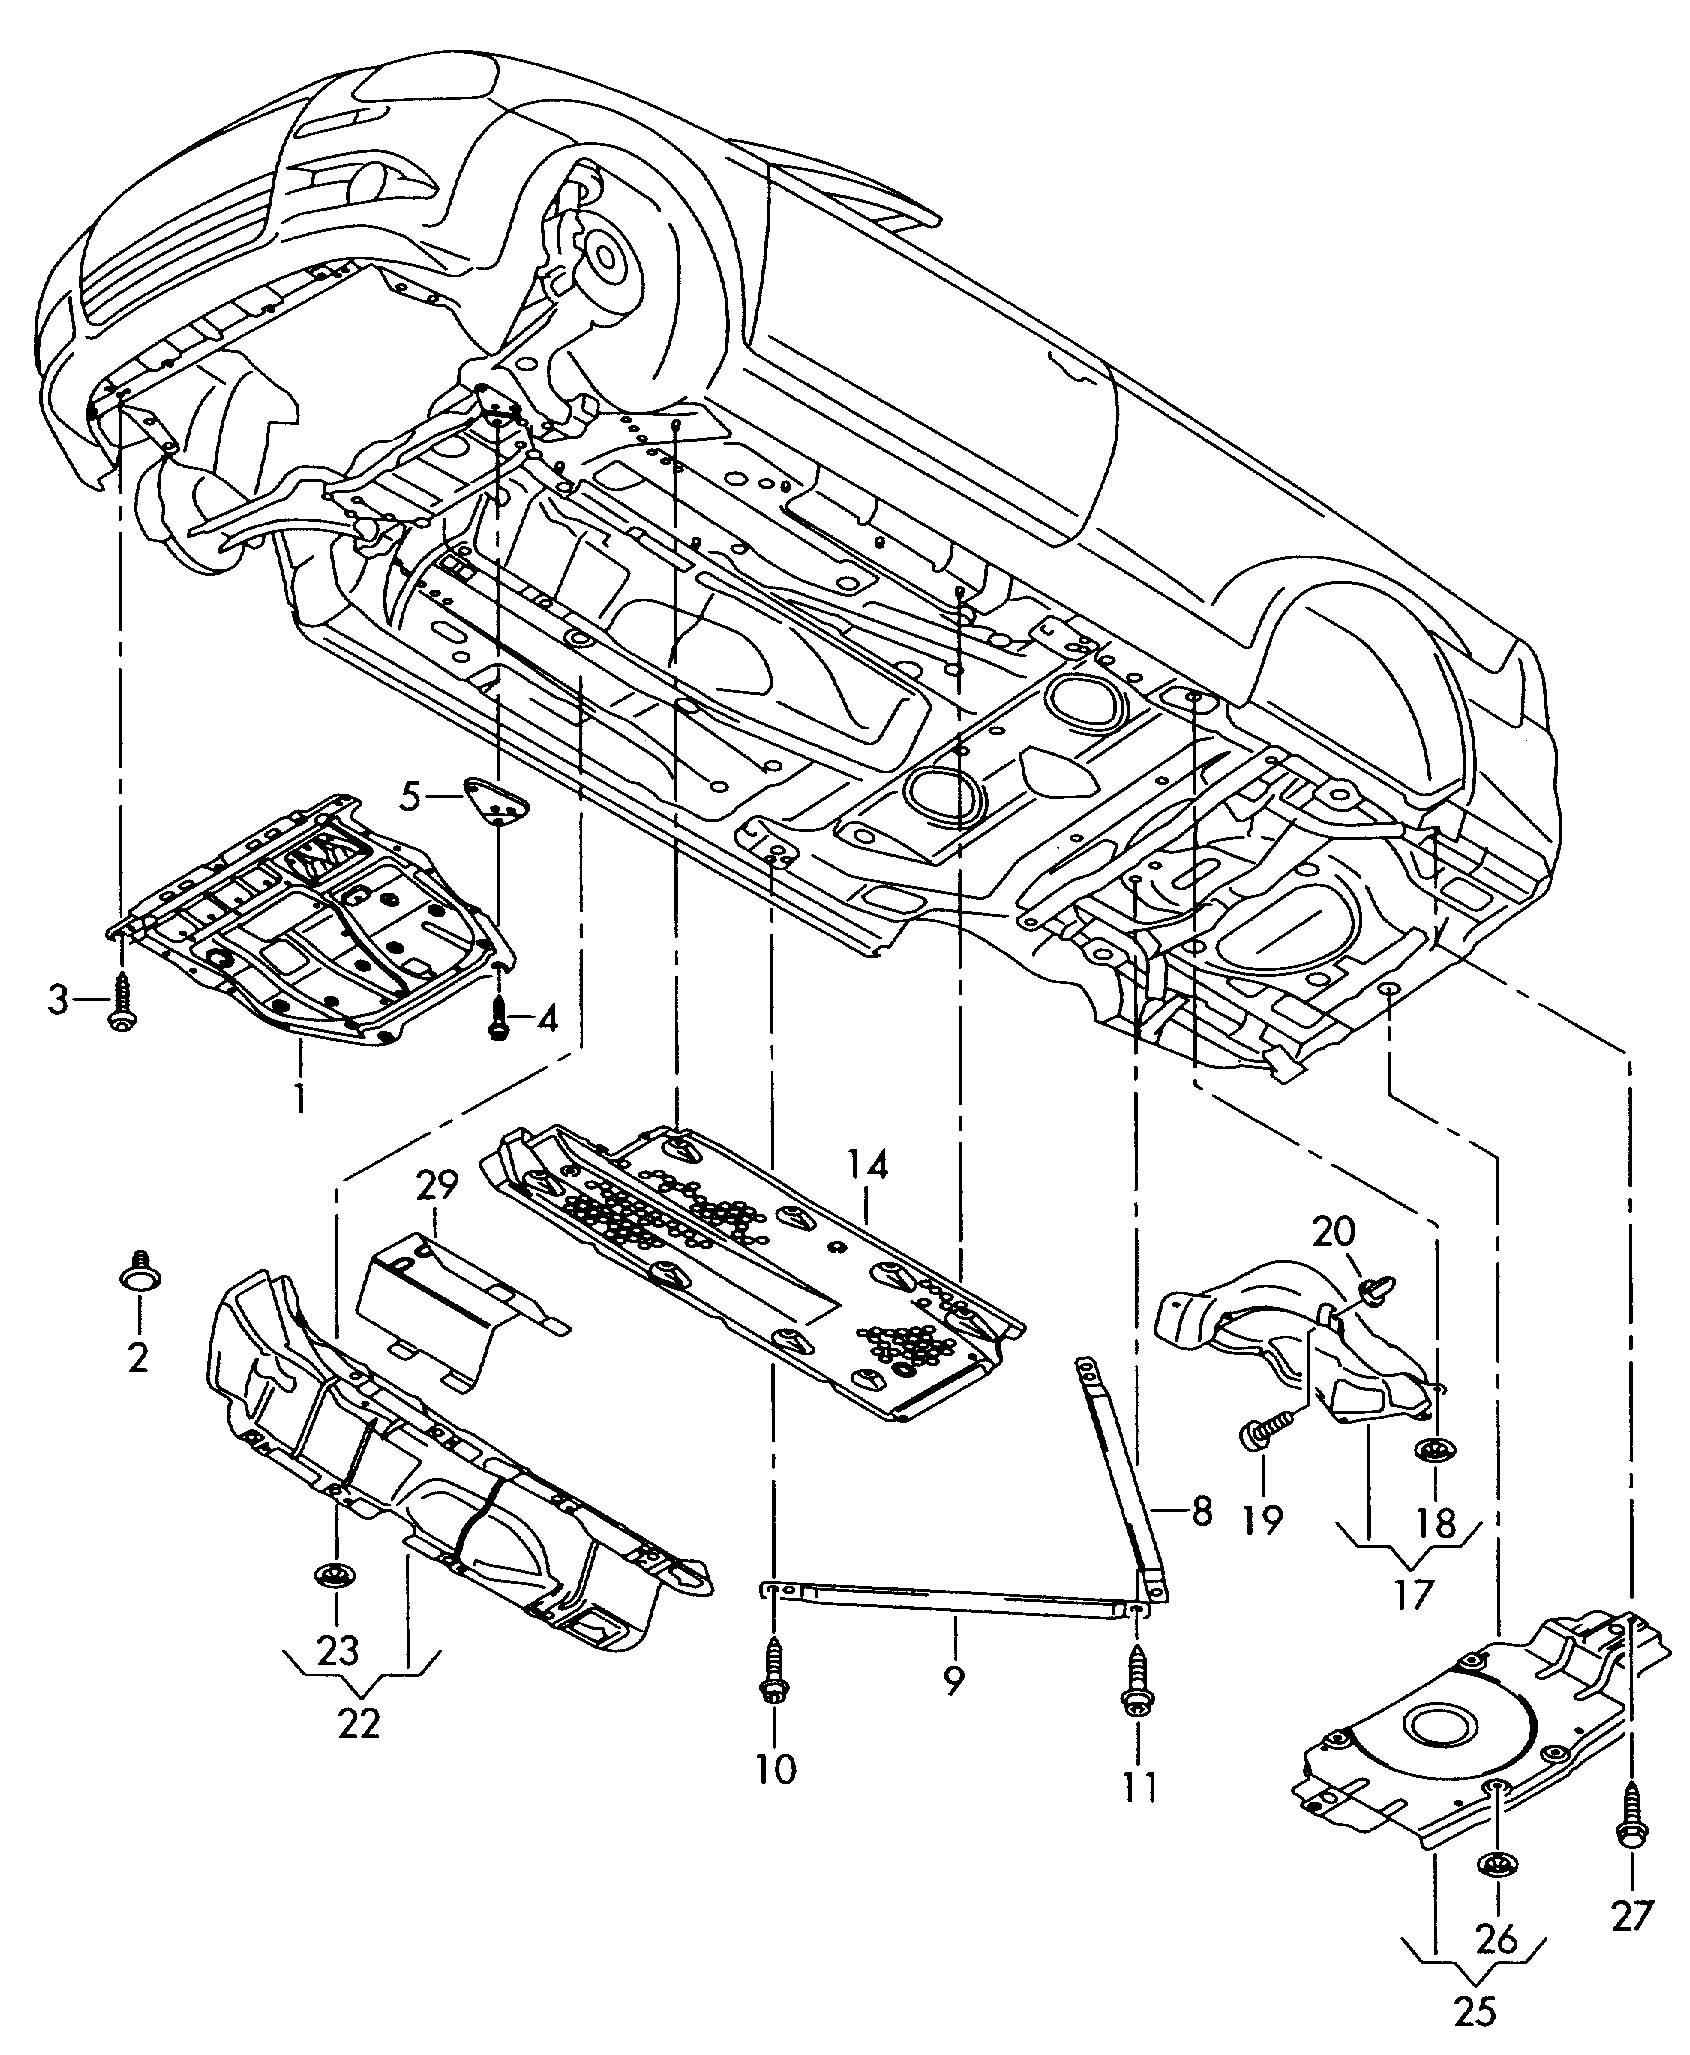 volkswagen tiguan wiring diagram stuffy nose 2016 vw fuse box guide diagrams auto